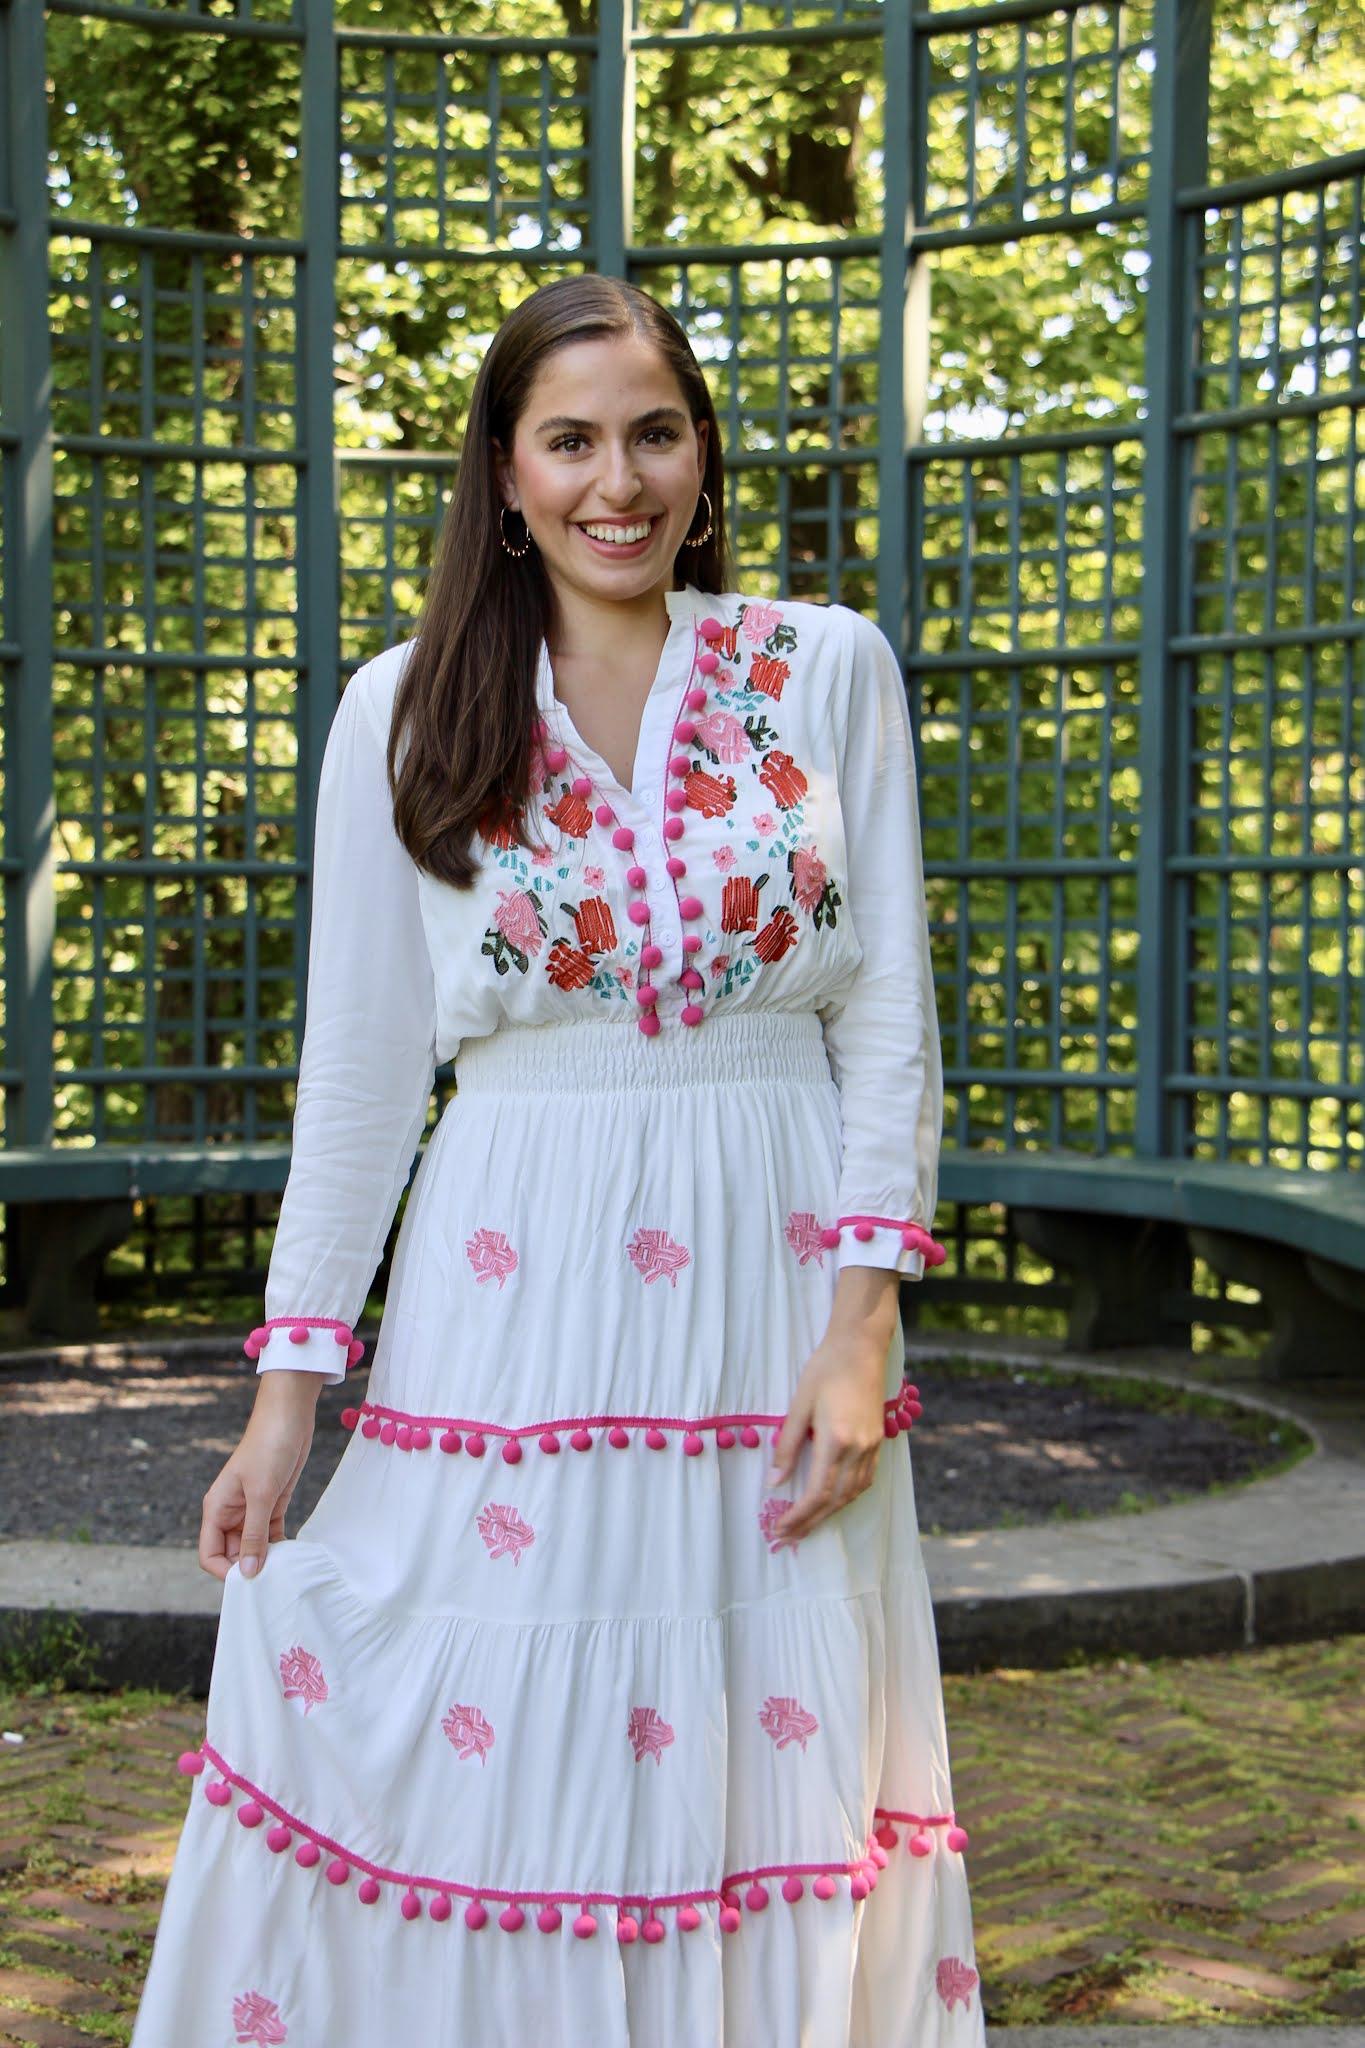 maxi dress, pom poms, embroidery, long island, summer